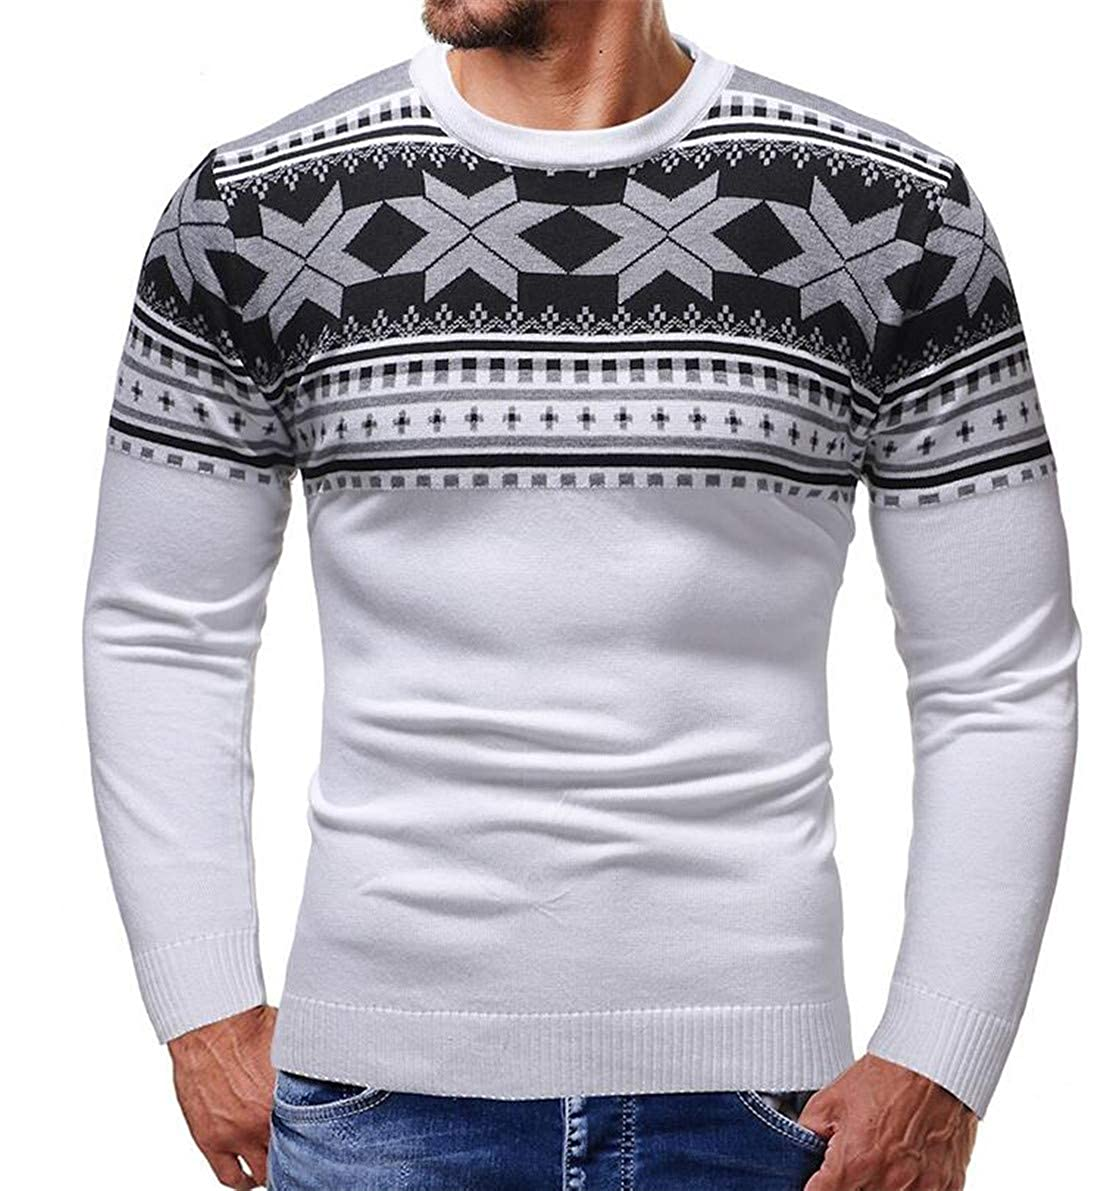 CRYYU Men Long Sleeve Crewneck Slim Pullover Christmas Knitted Sweater